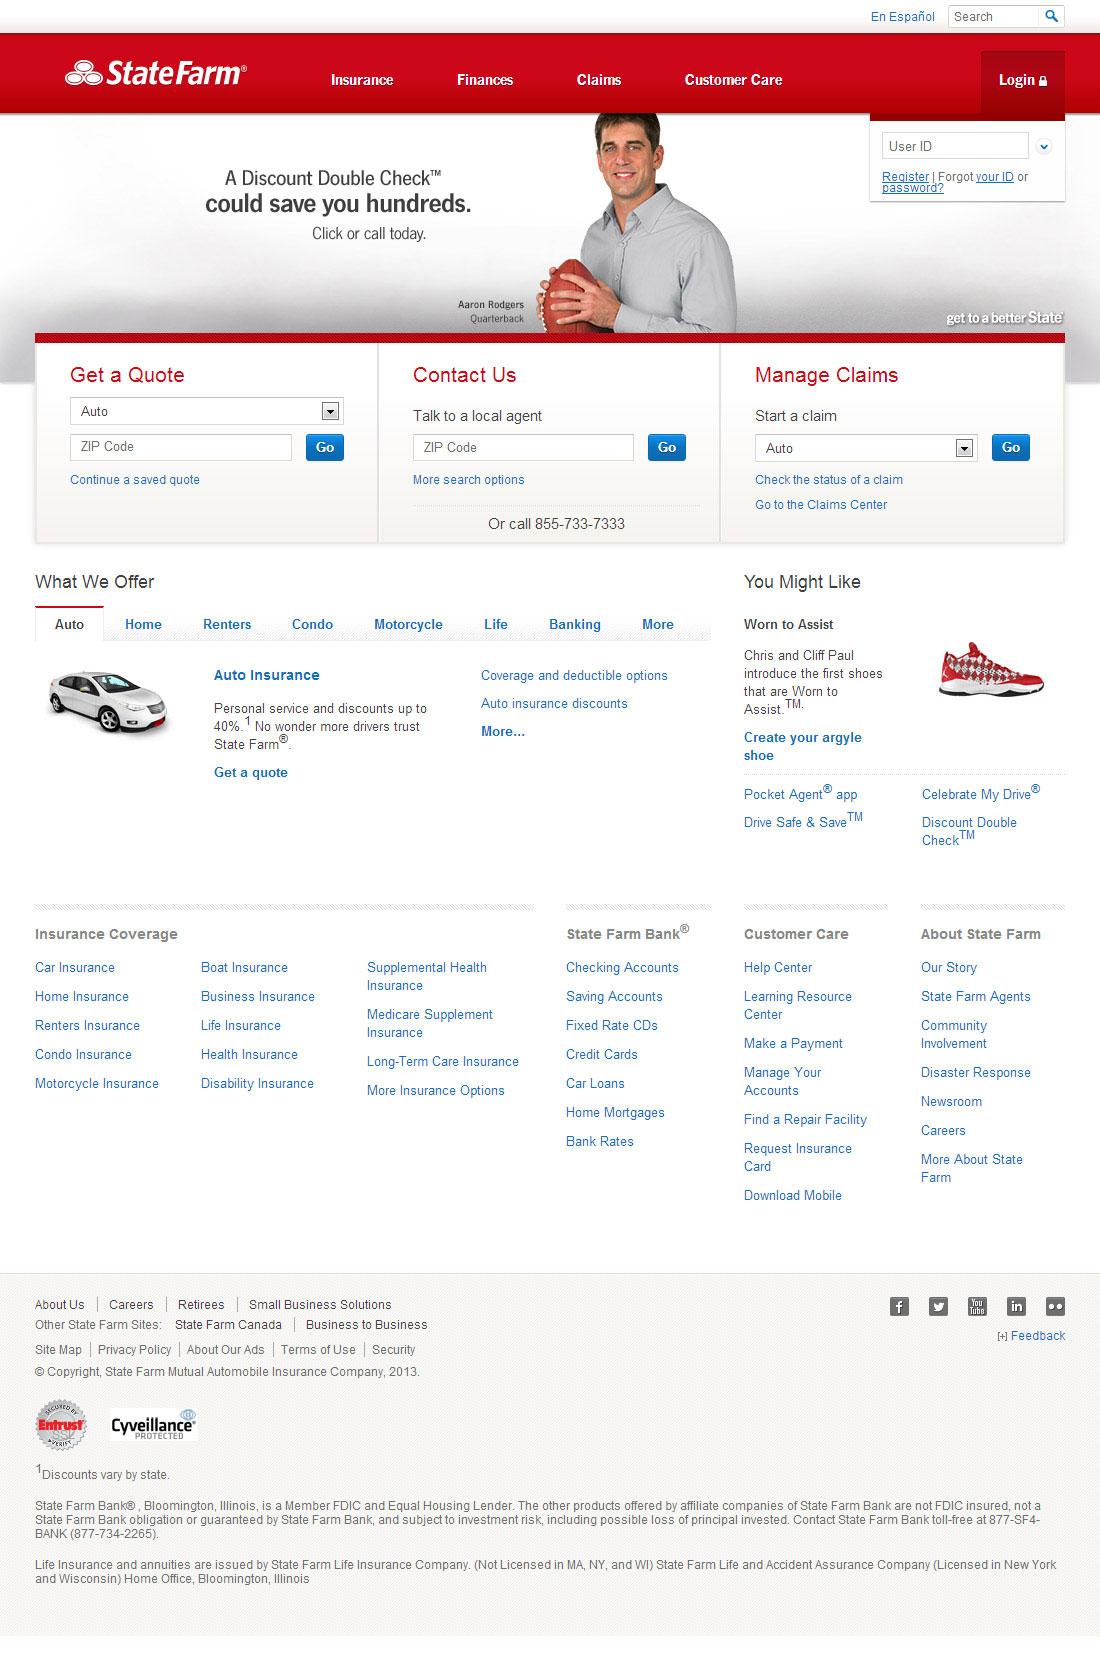 State Farm保险官方网站